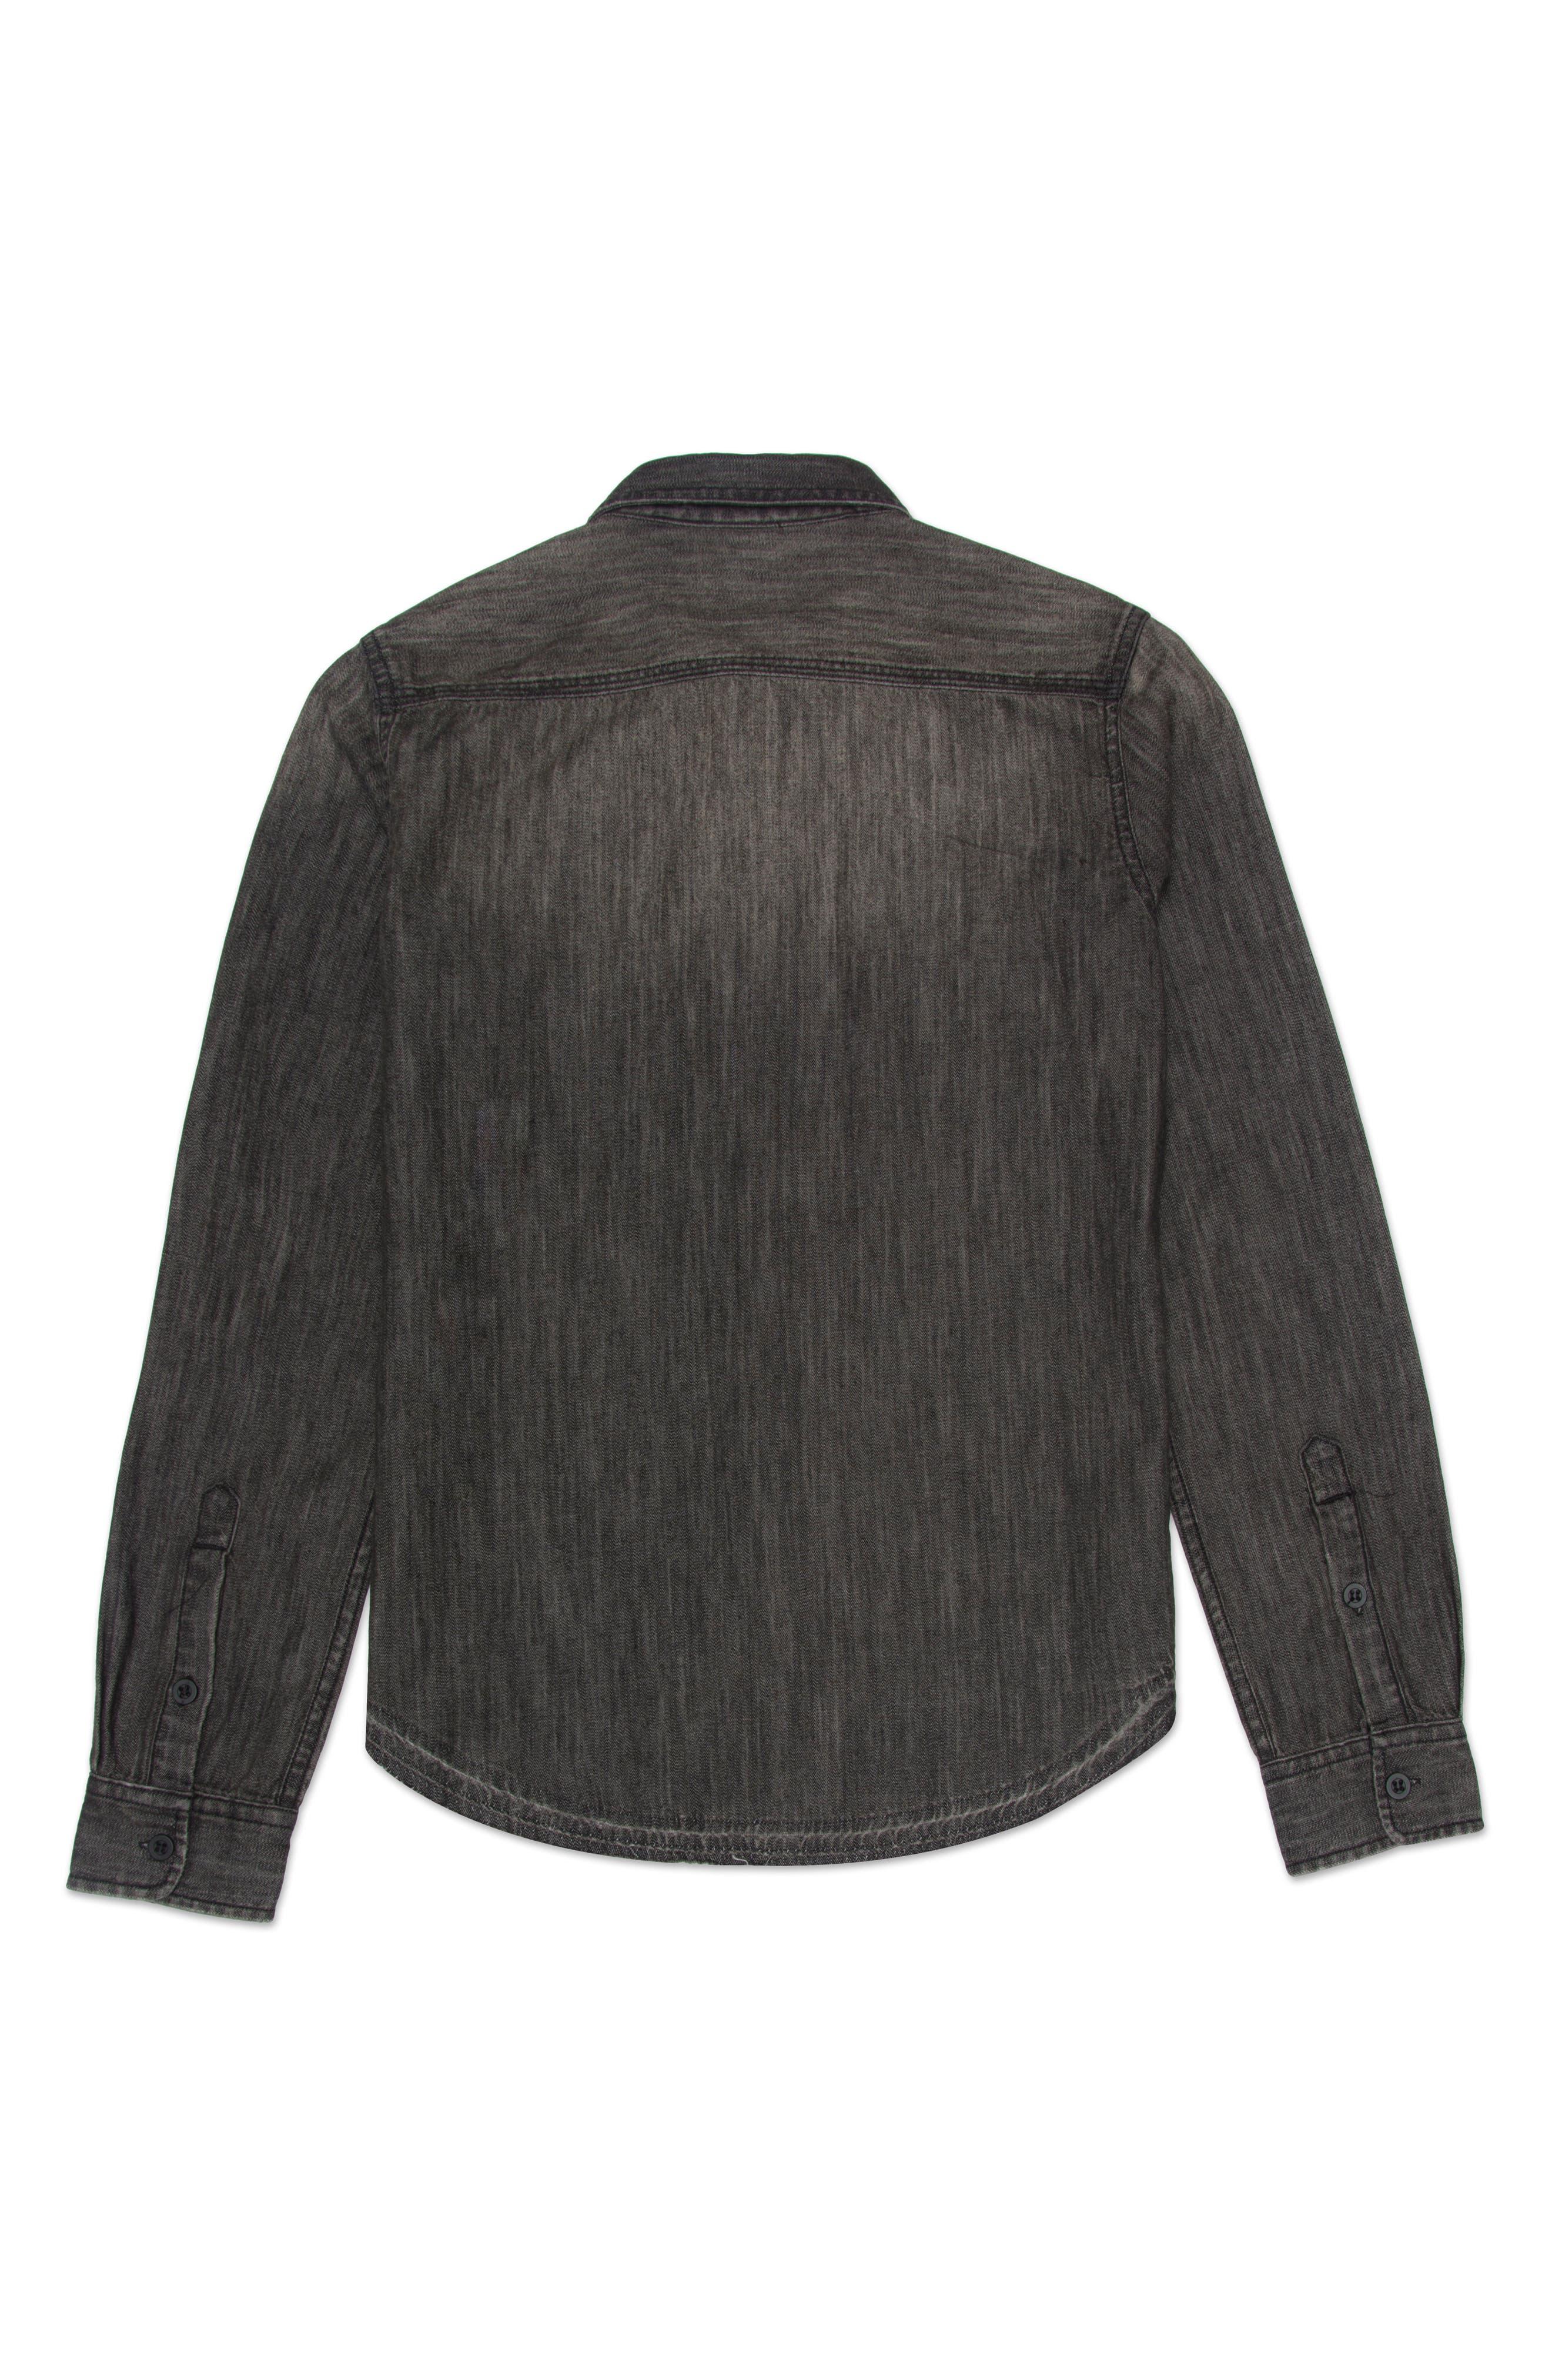 Bryson Shirt,                             Alternate thumbnail 2, color,                             Faded Black